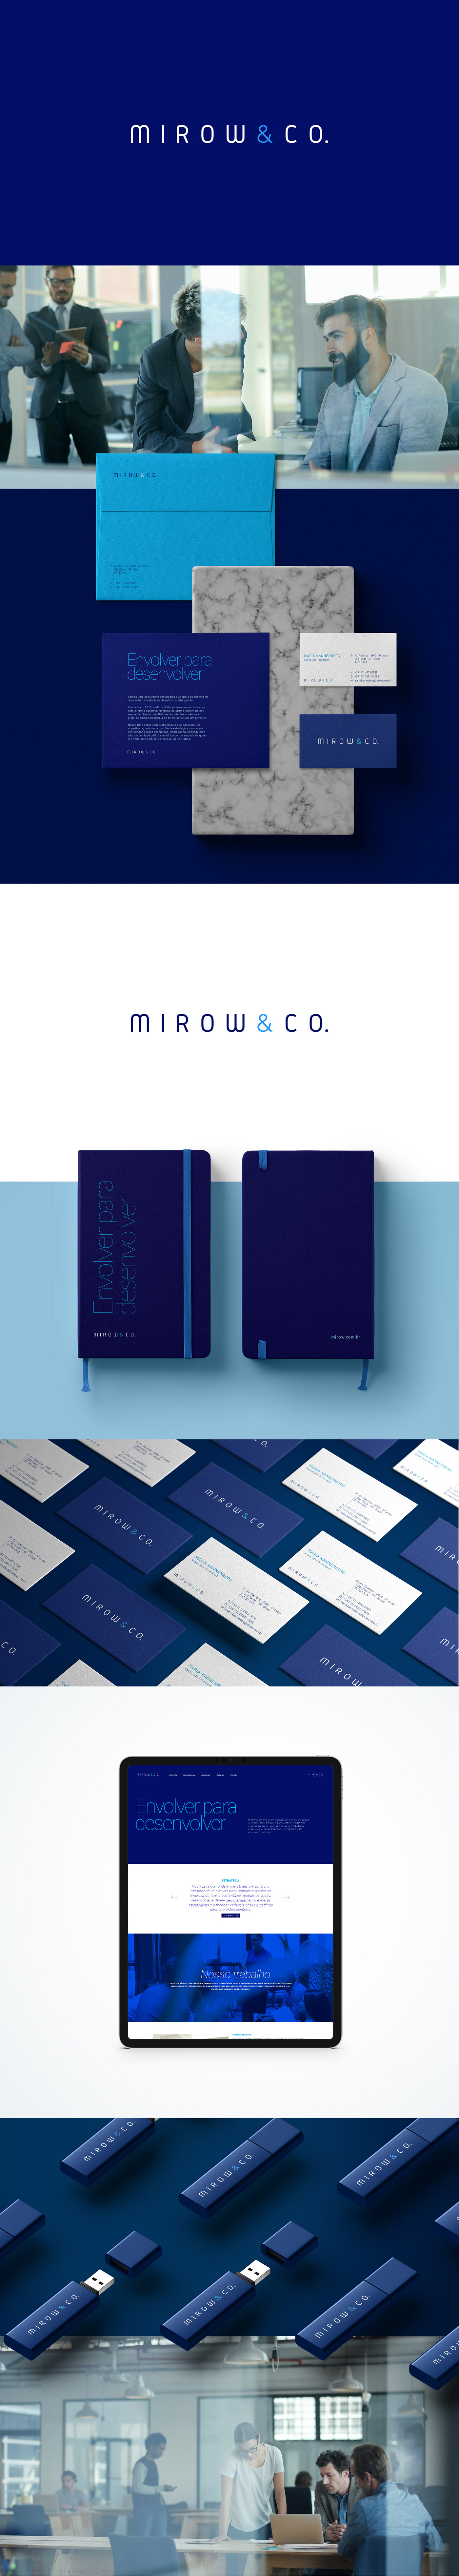 branding  Consulting corporate visual identity logo Logotipo Logotype identidade visual consultoria